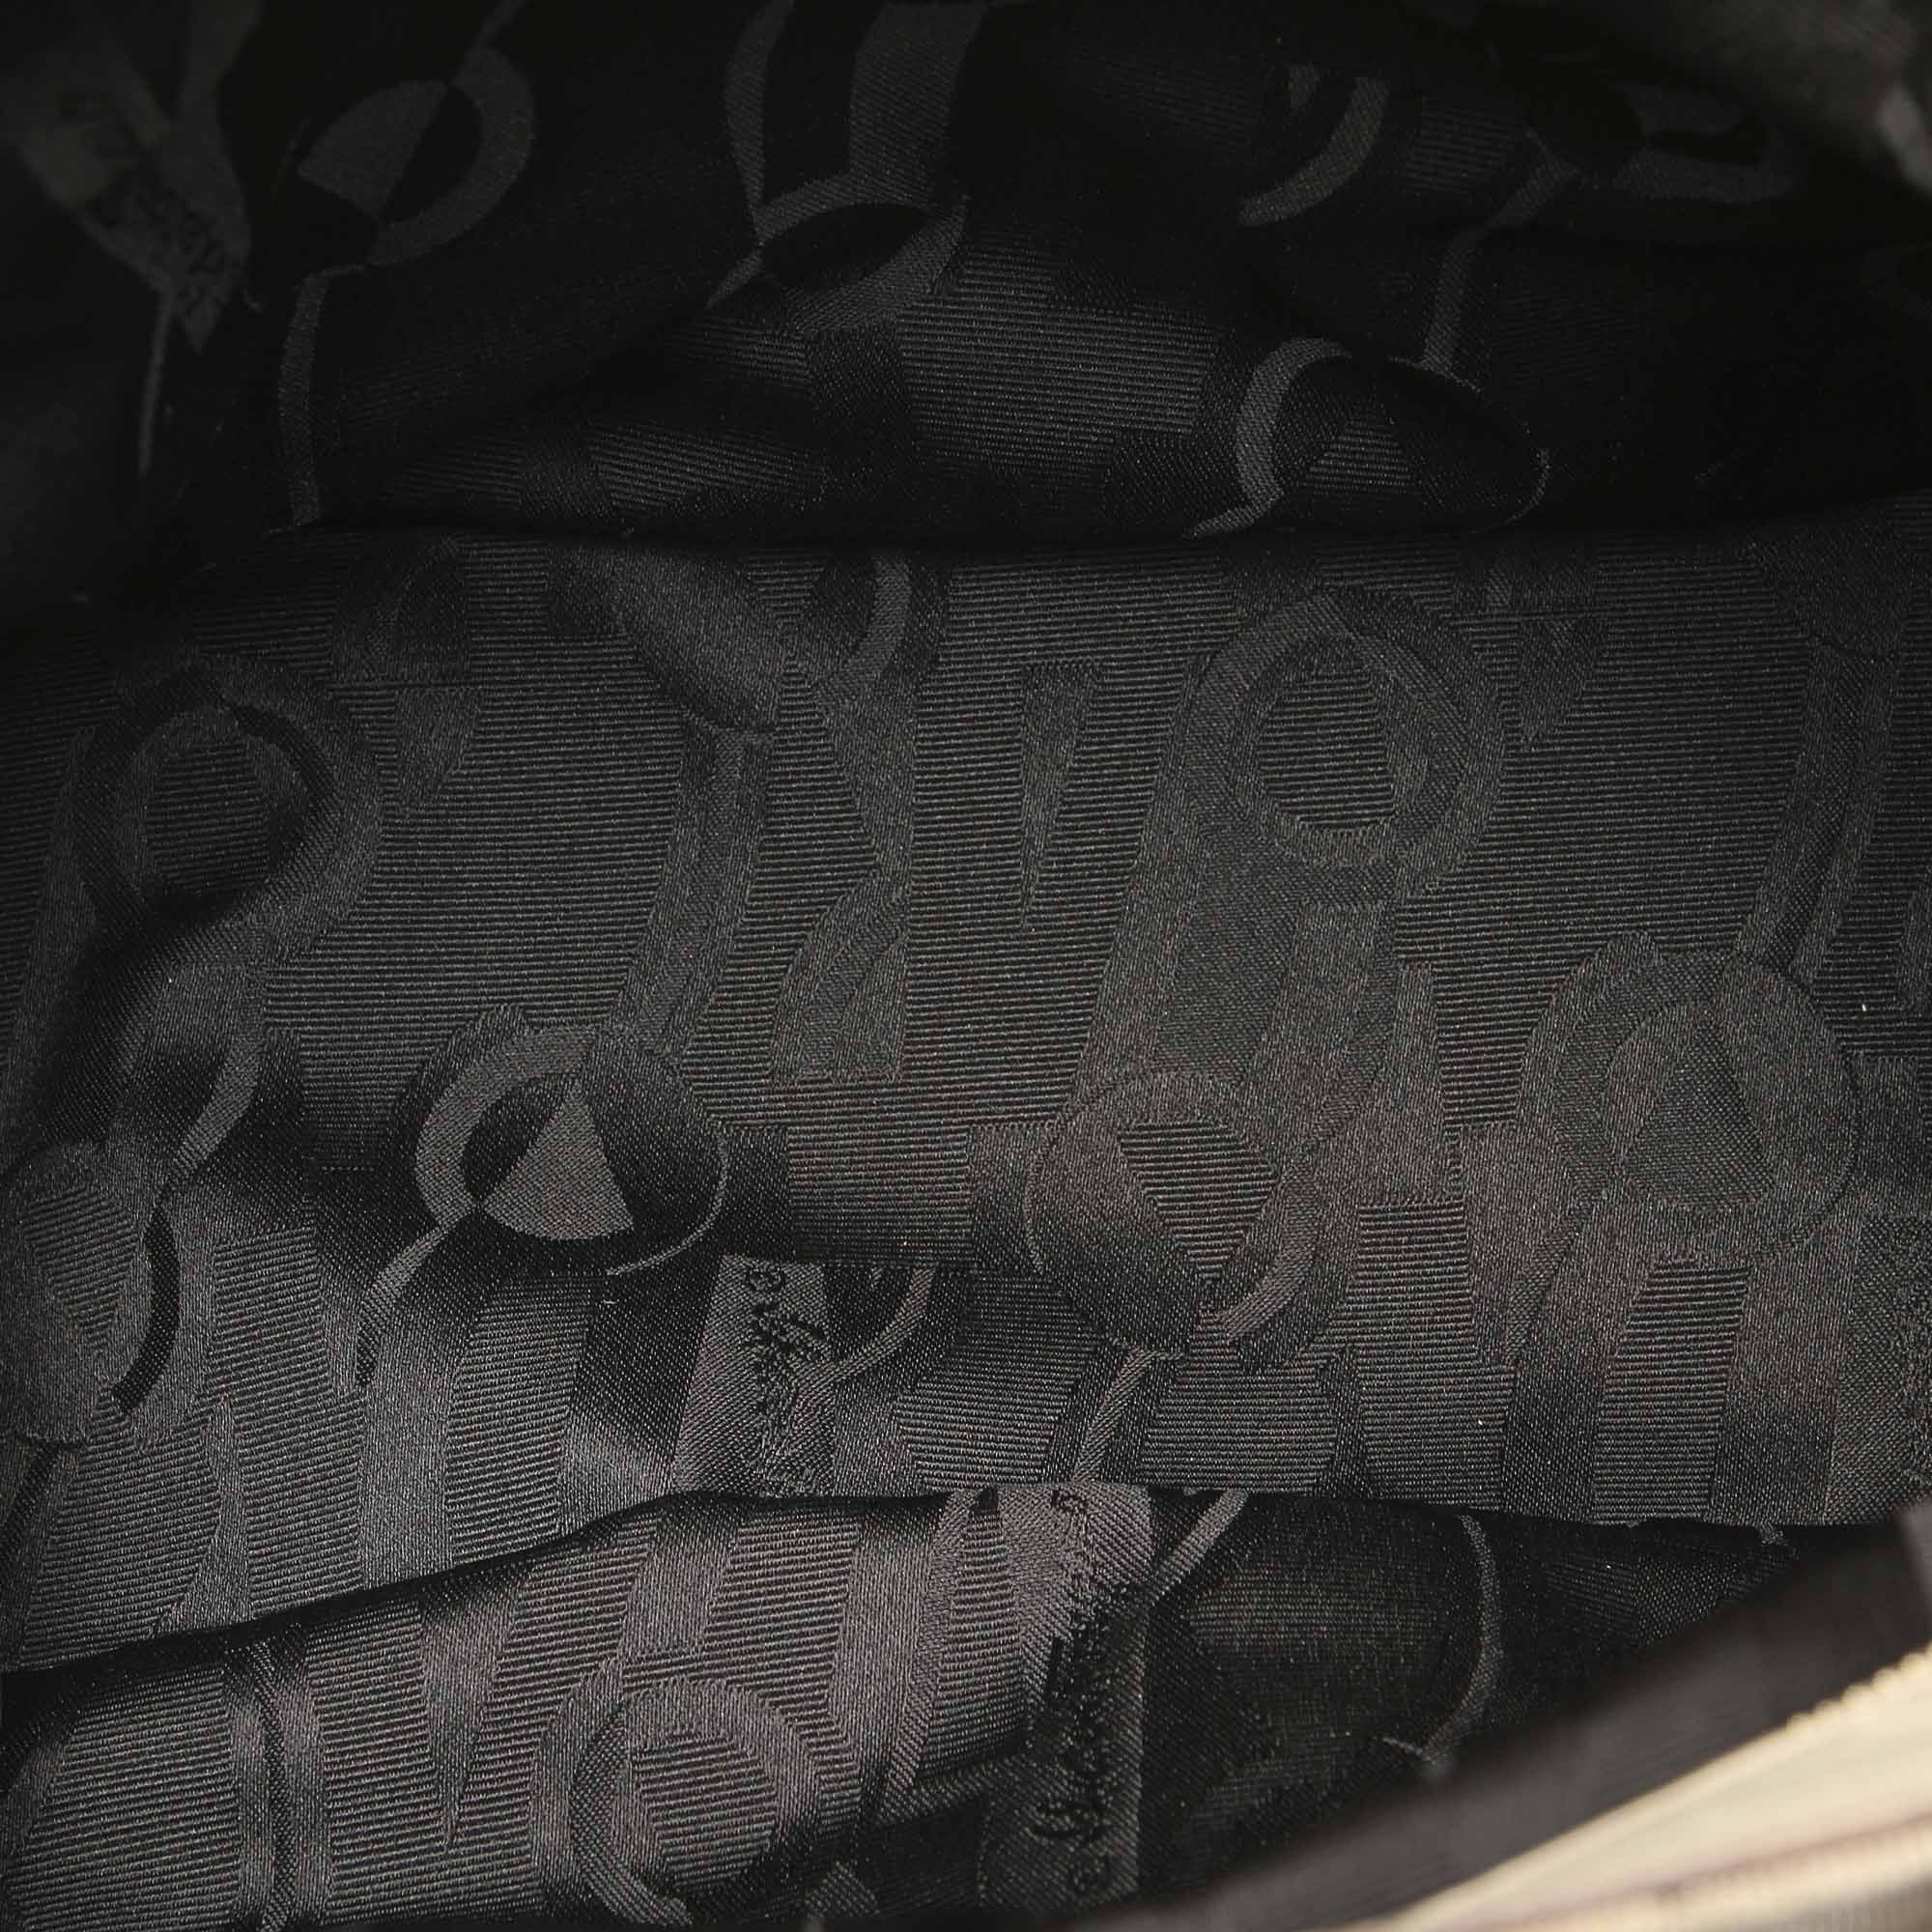 Vintage Ferragamo Tiered Grosgrain Chain Tote Bag Gray